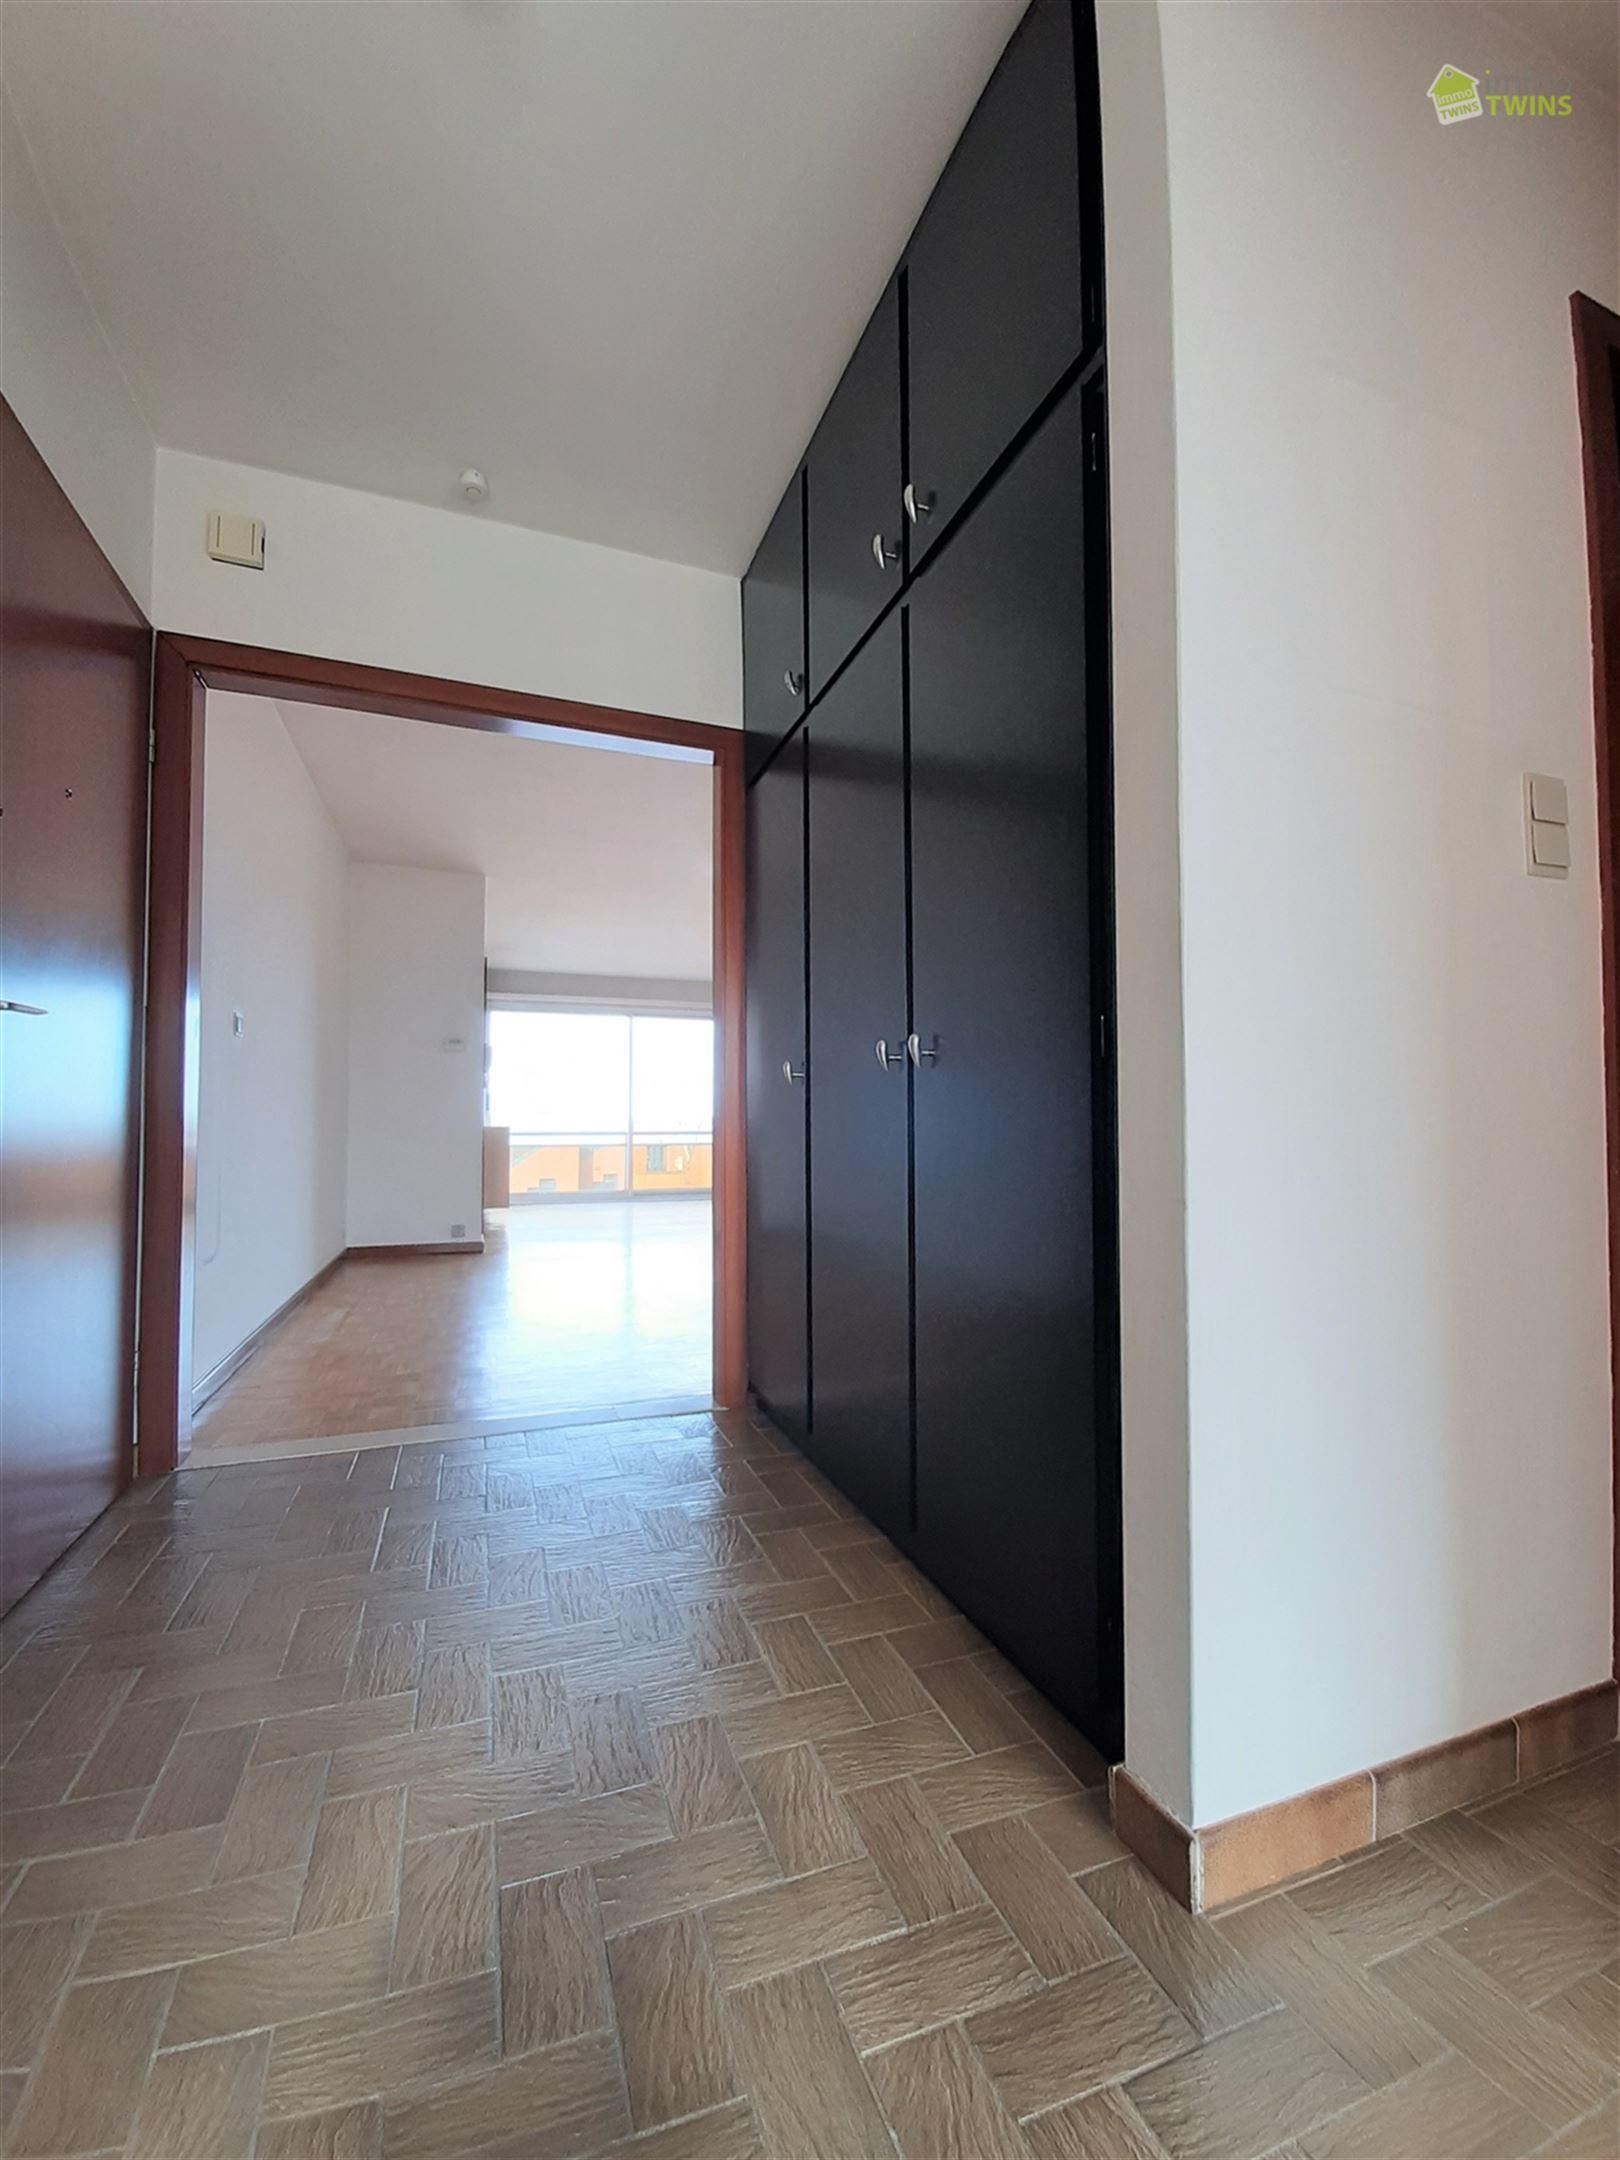 Foto 8 : Appartement te 9200 DENDERMONDE (België) - Prijs € 600